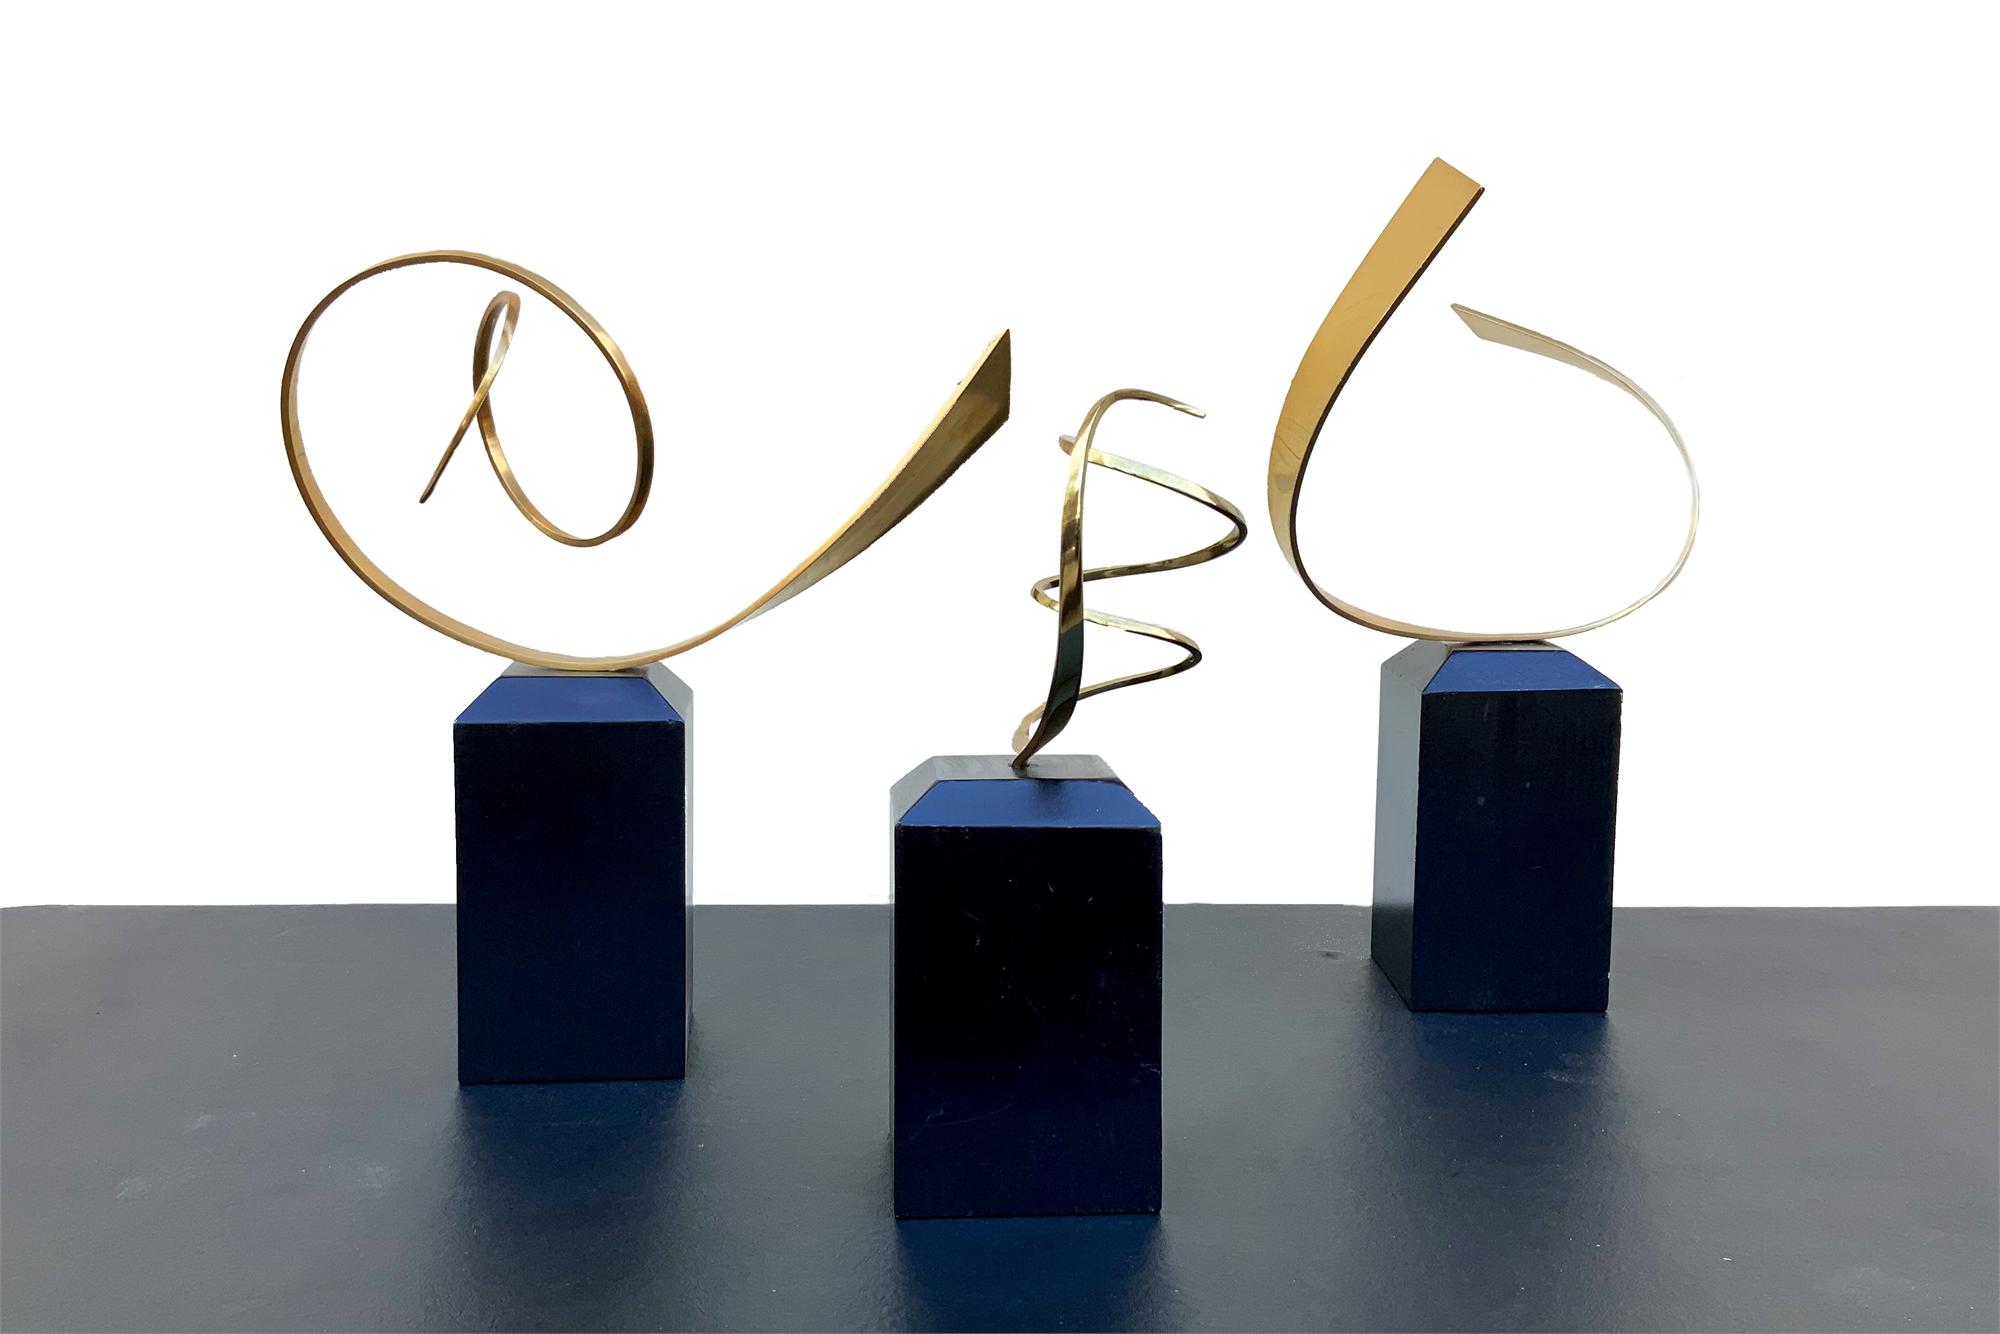 Sculpture 3 by Martin Conley (Hillsboro, OR)